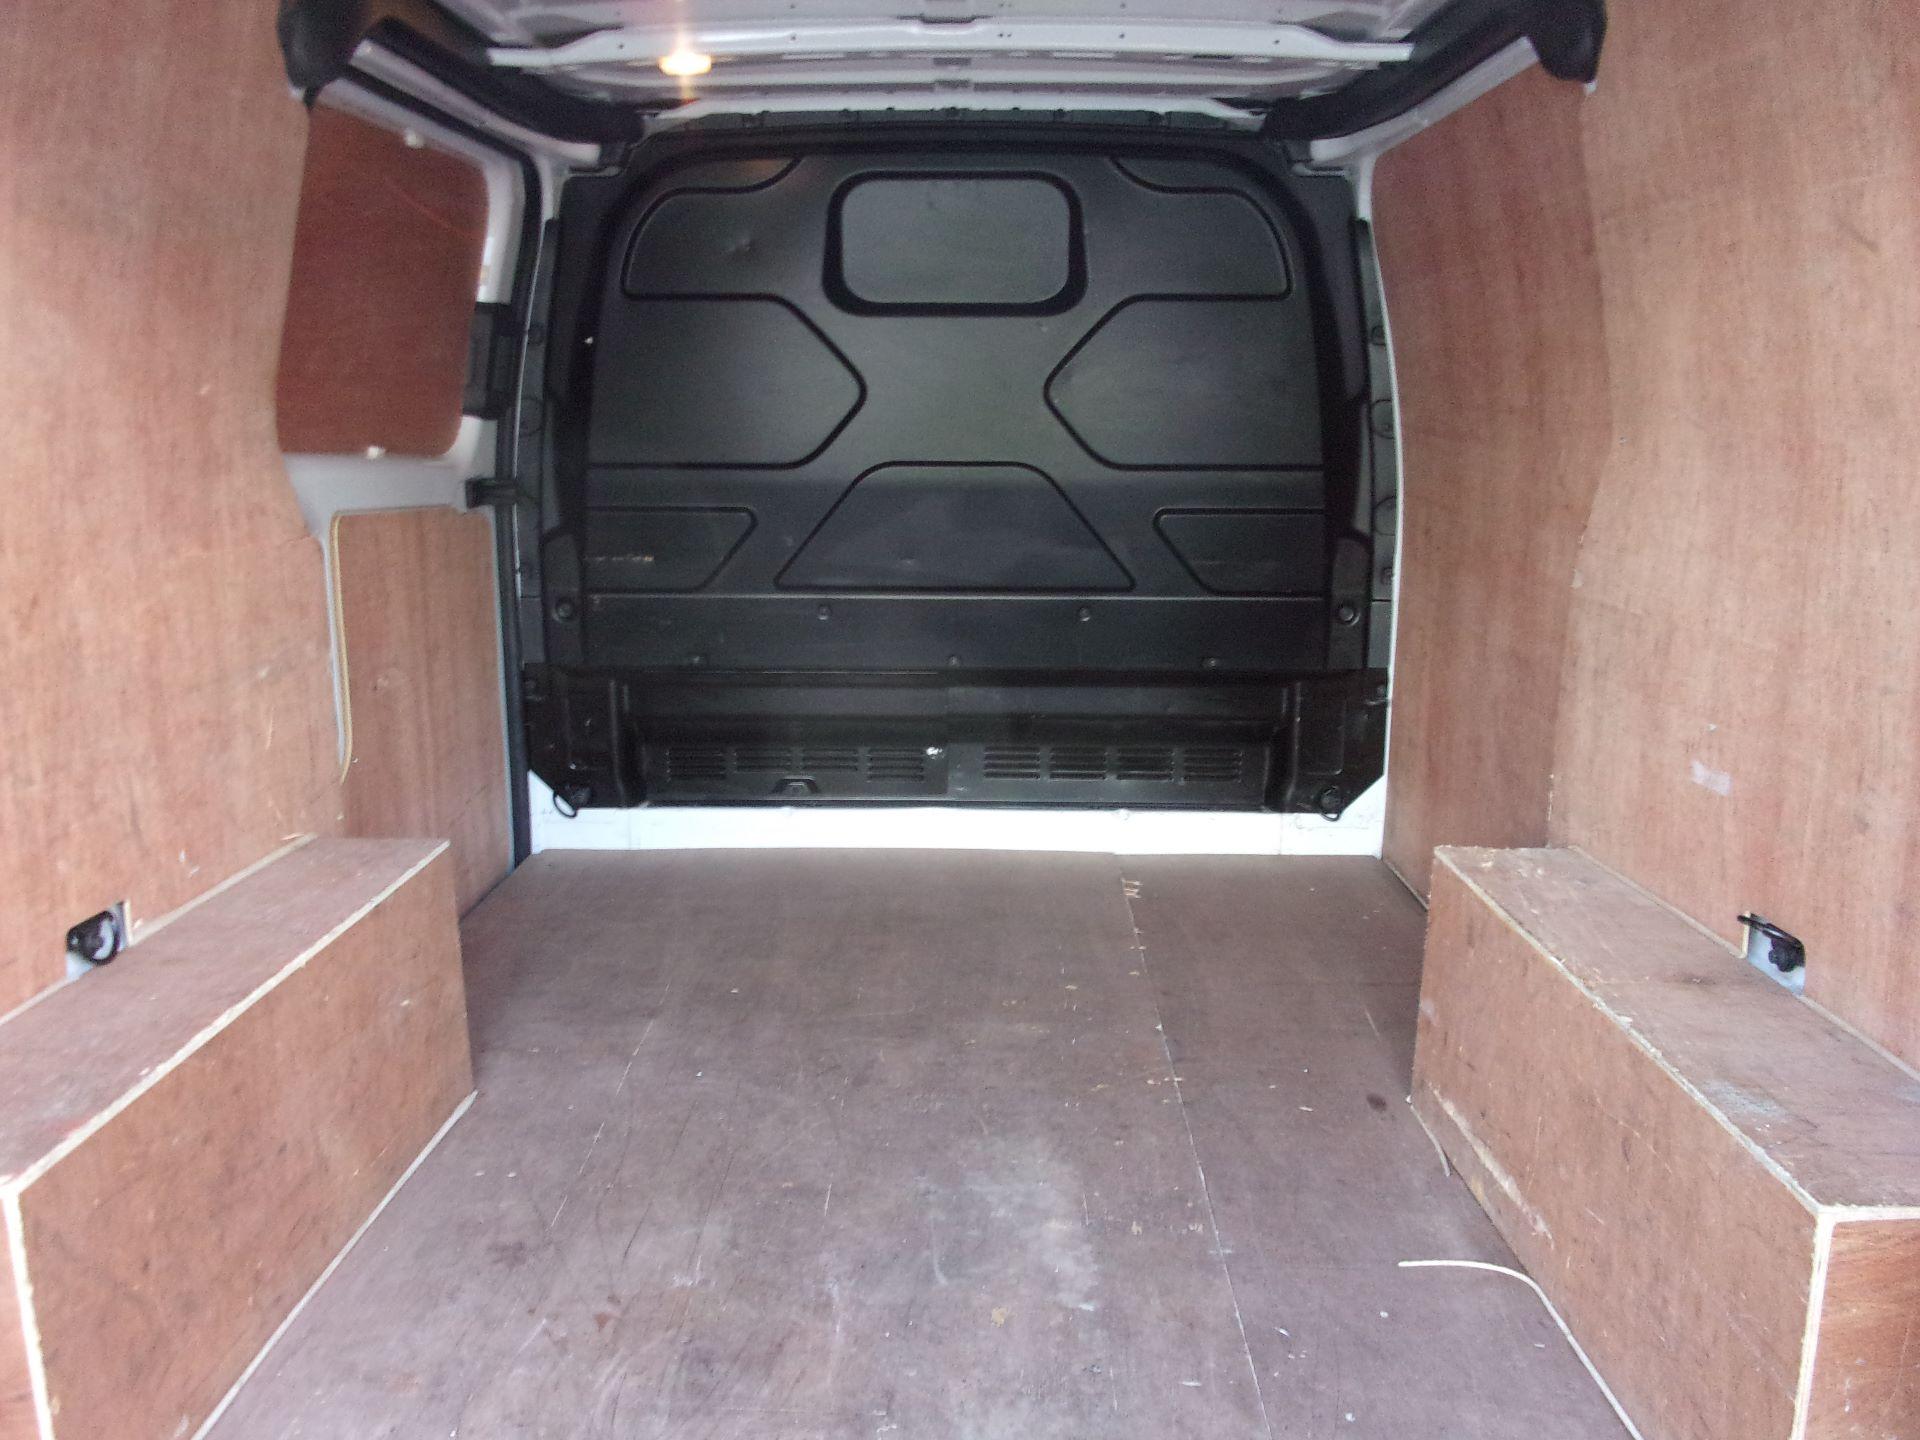 2018 Ford Transit Custom 300 L1 DIESEL FWD 2.0 TDCI 105PS LOW ROOF VAN EURO 6 (FD18VZC) Image 18